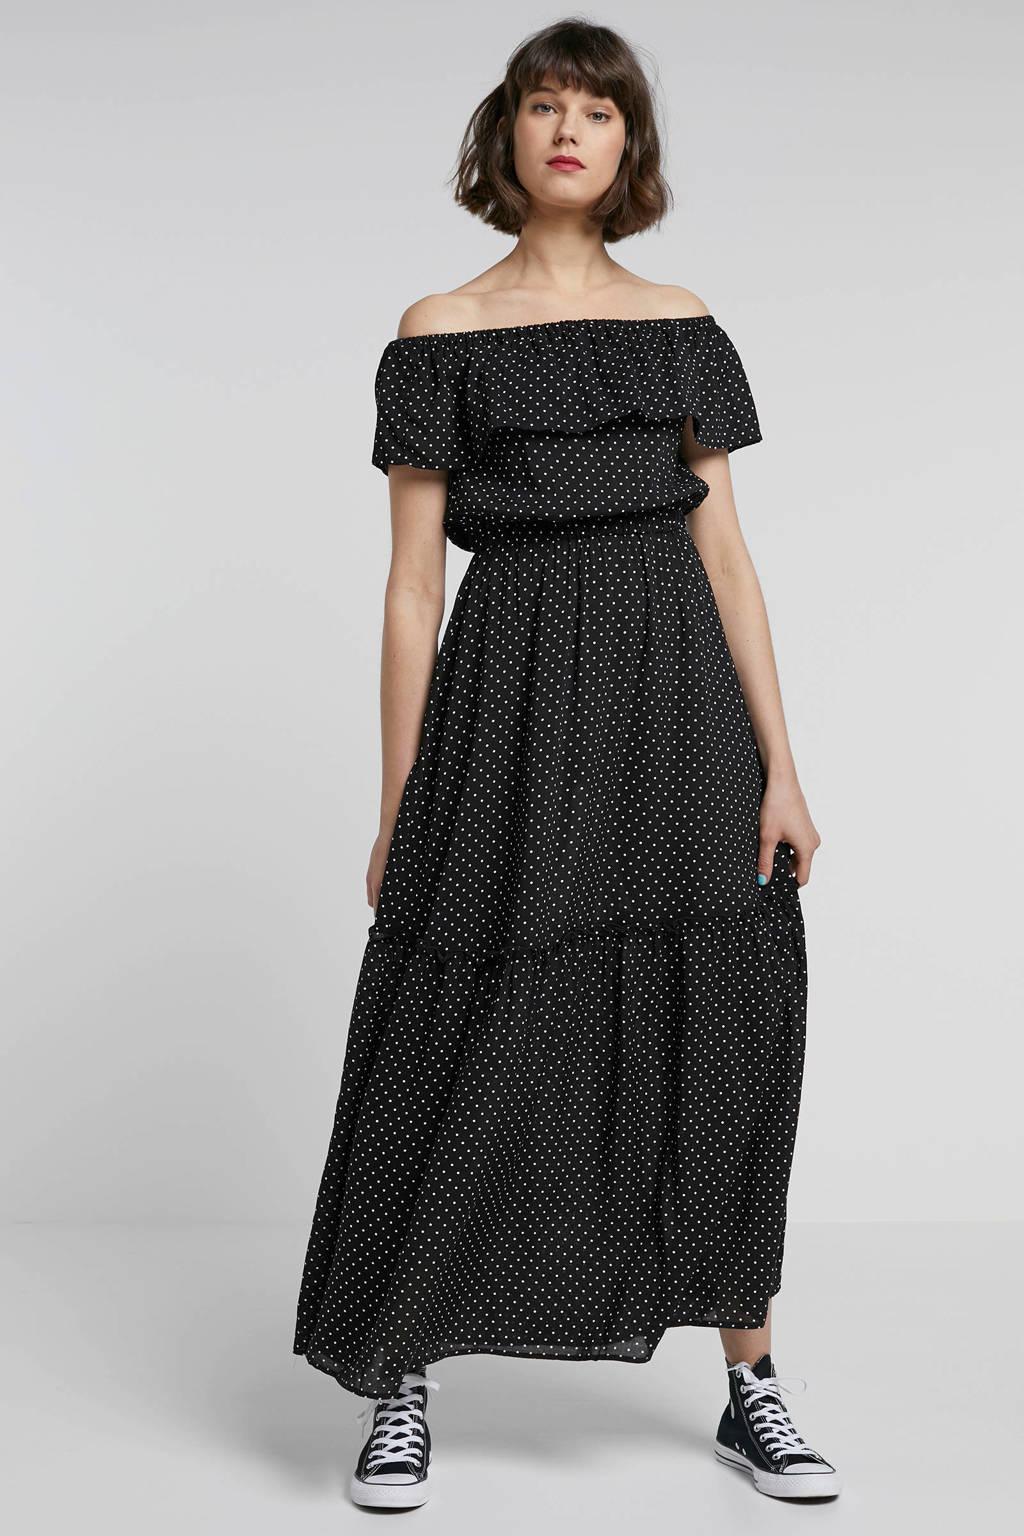 ONLY jurk met stippen en volant zwart, Zwart/wit